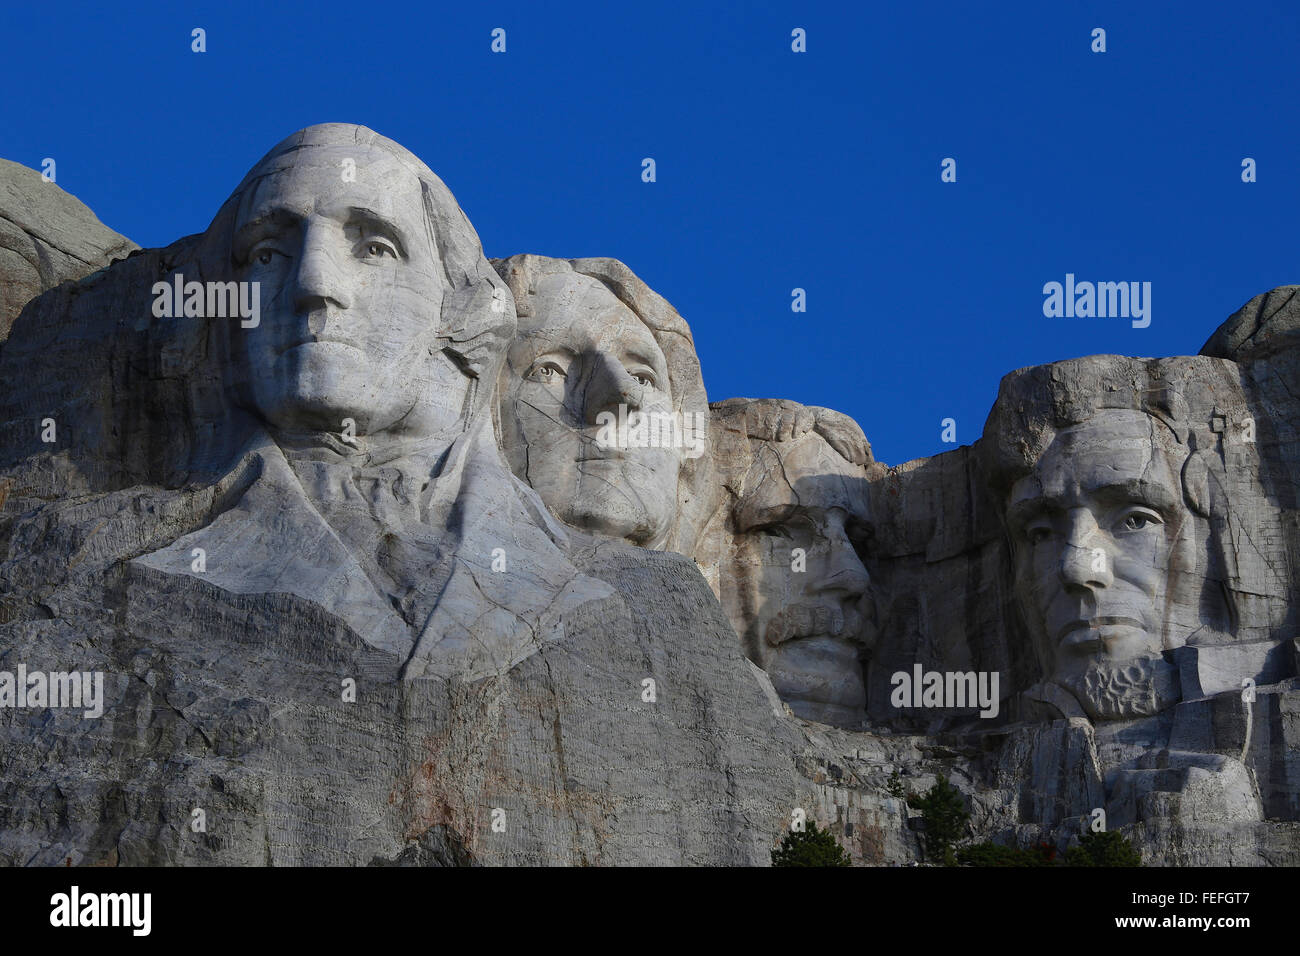 El Monumento Nacional Monte Rushmore clear blue sky Imagen De Stock